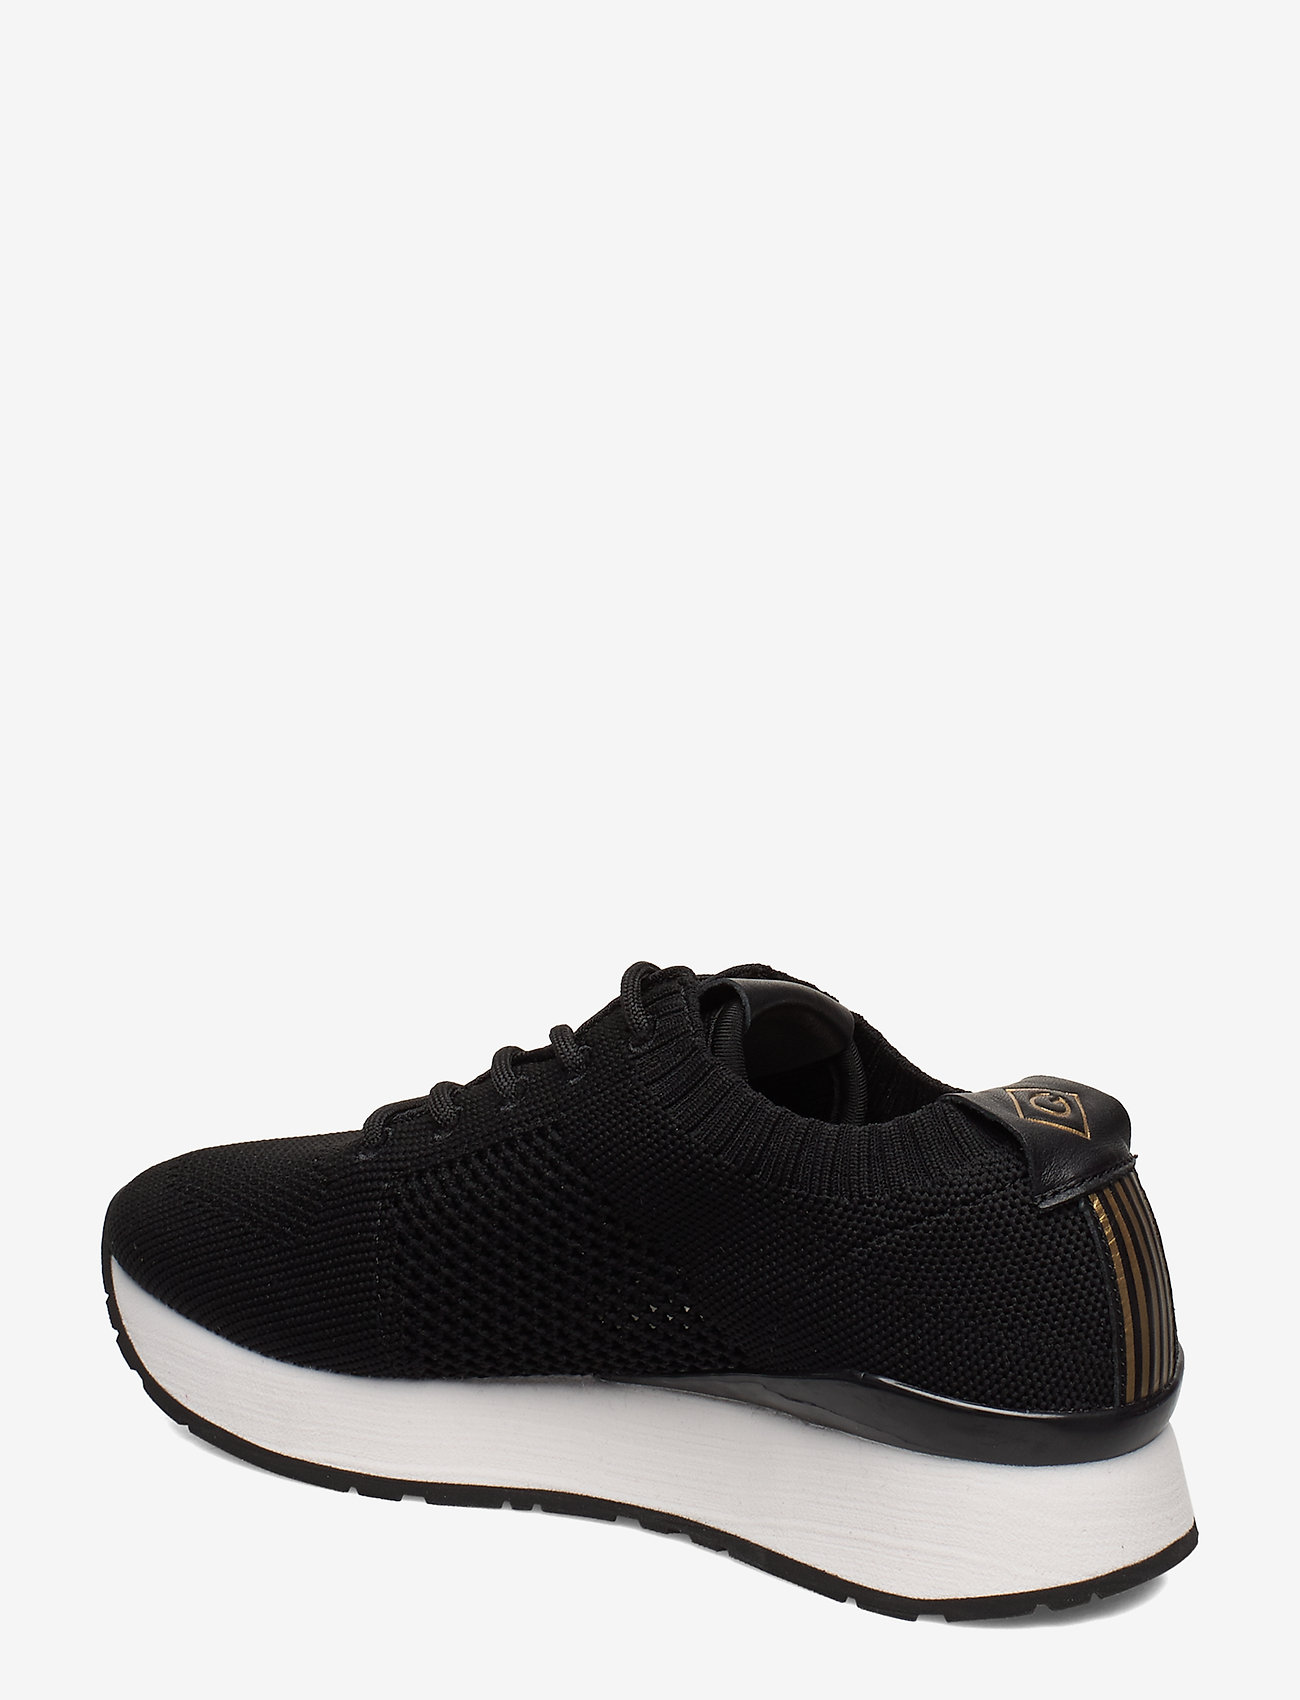 Bevinda Sneaker (Black) - GANT